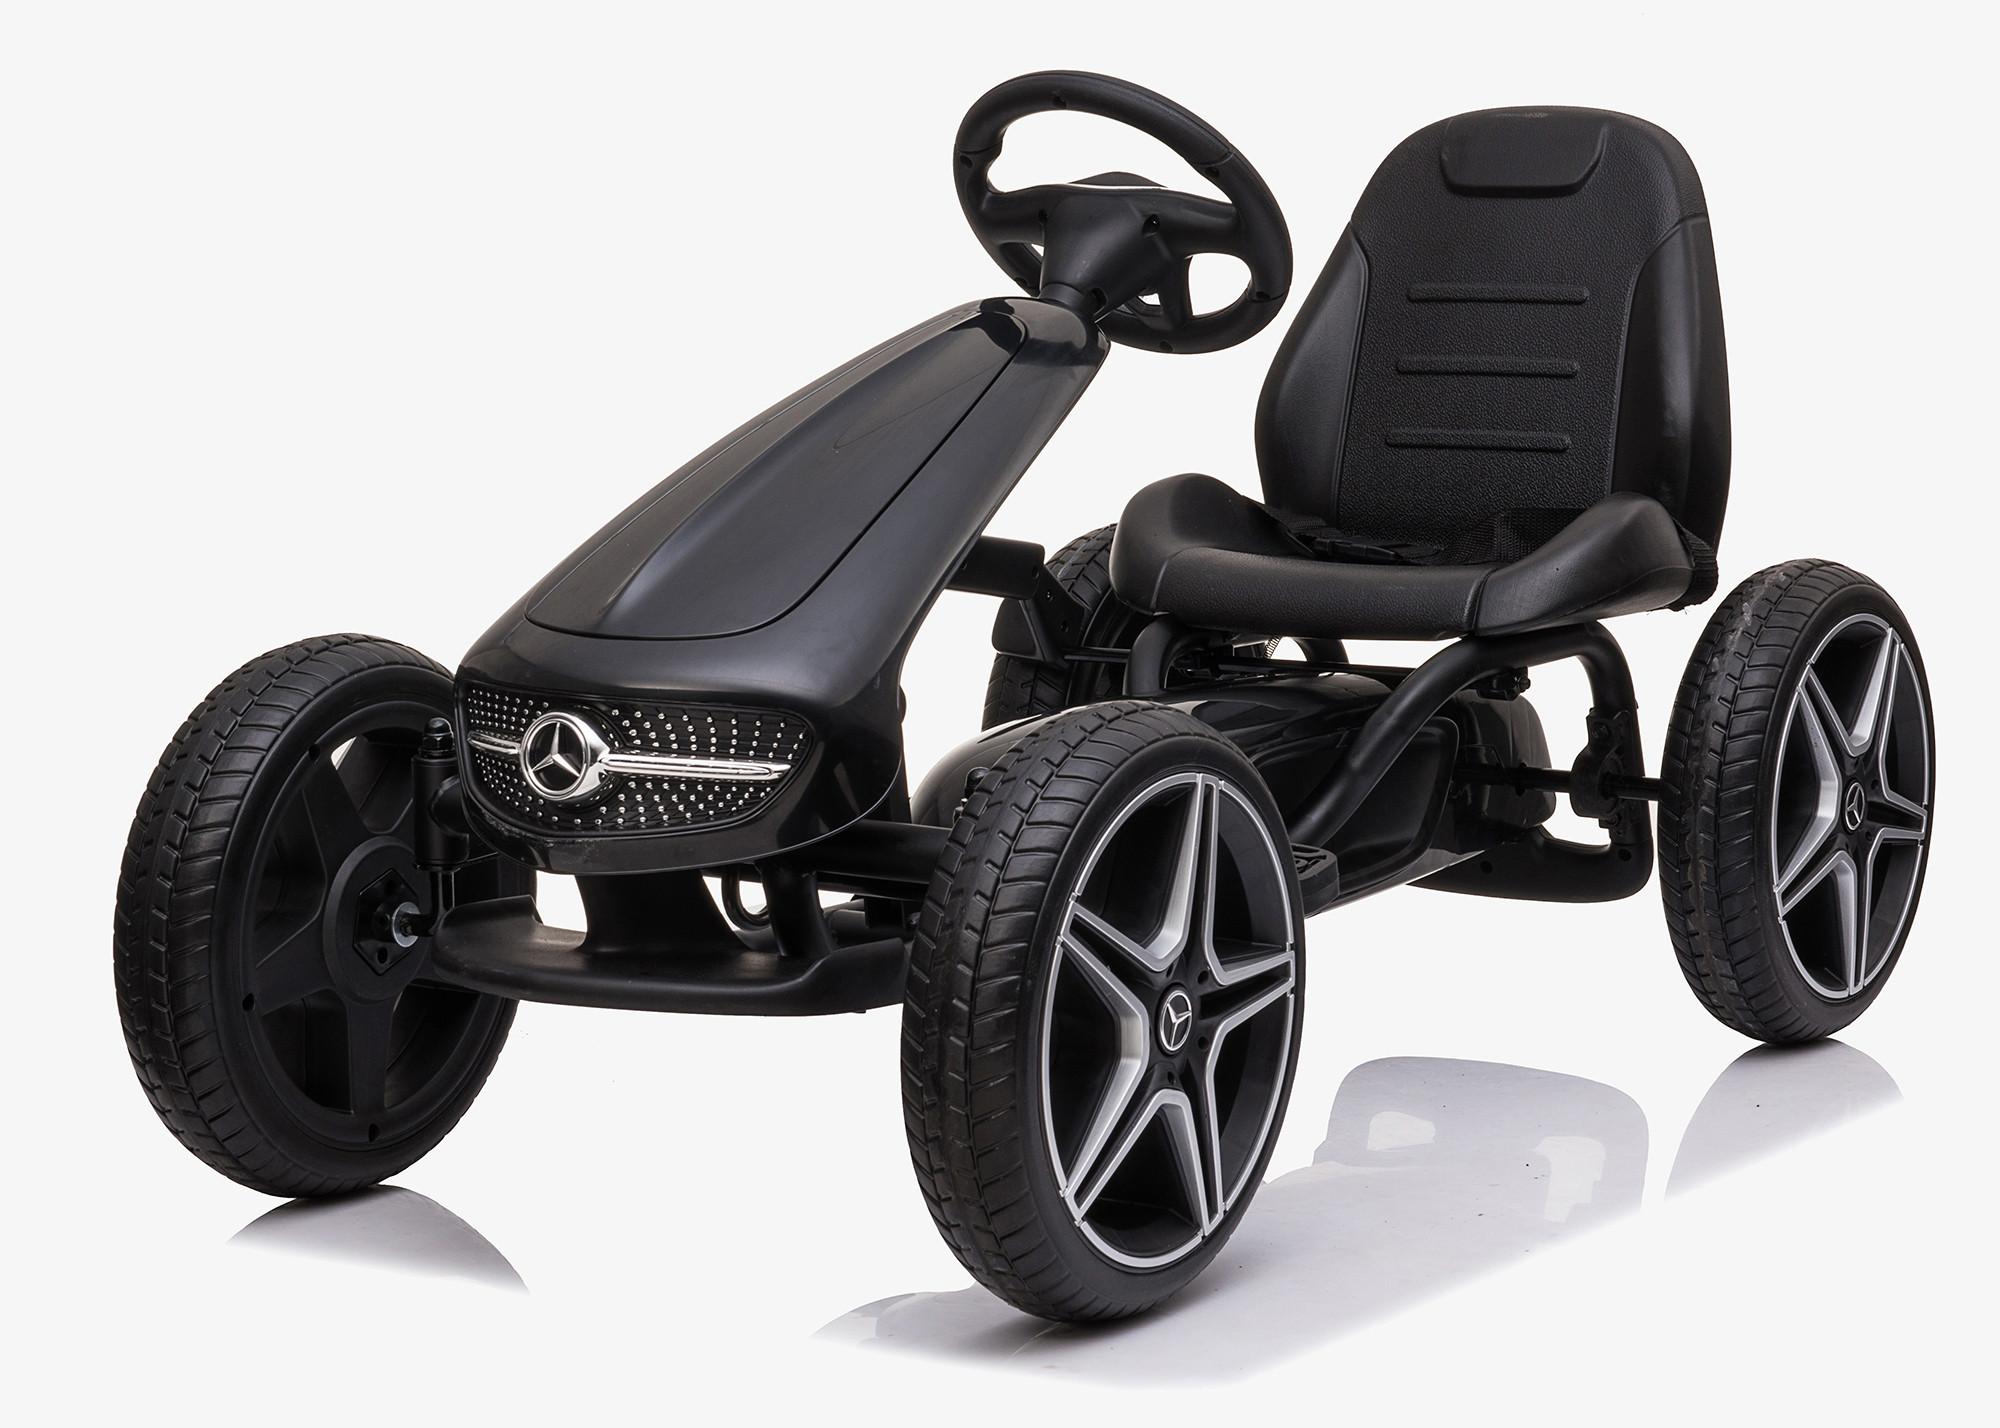 Xtreme Kids Official Licensed Mercedes Benz Go Kart with Hand Brake in Black